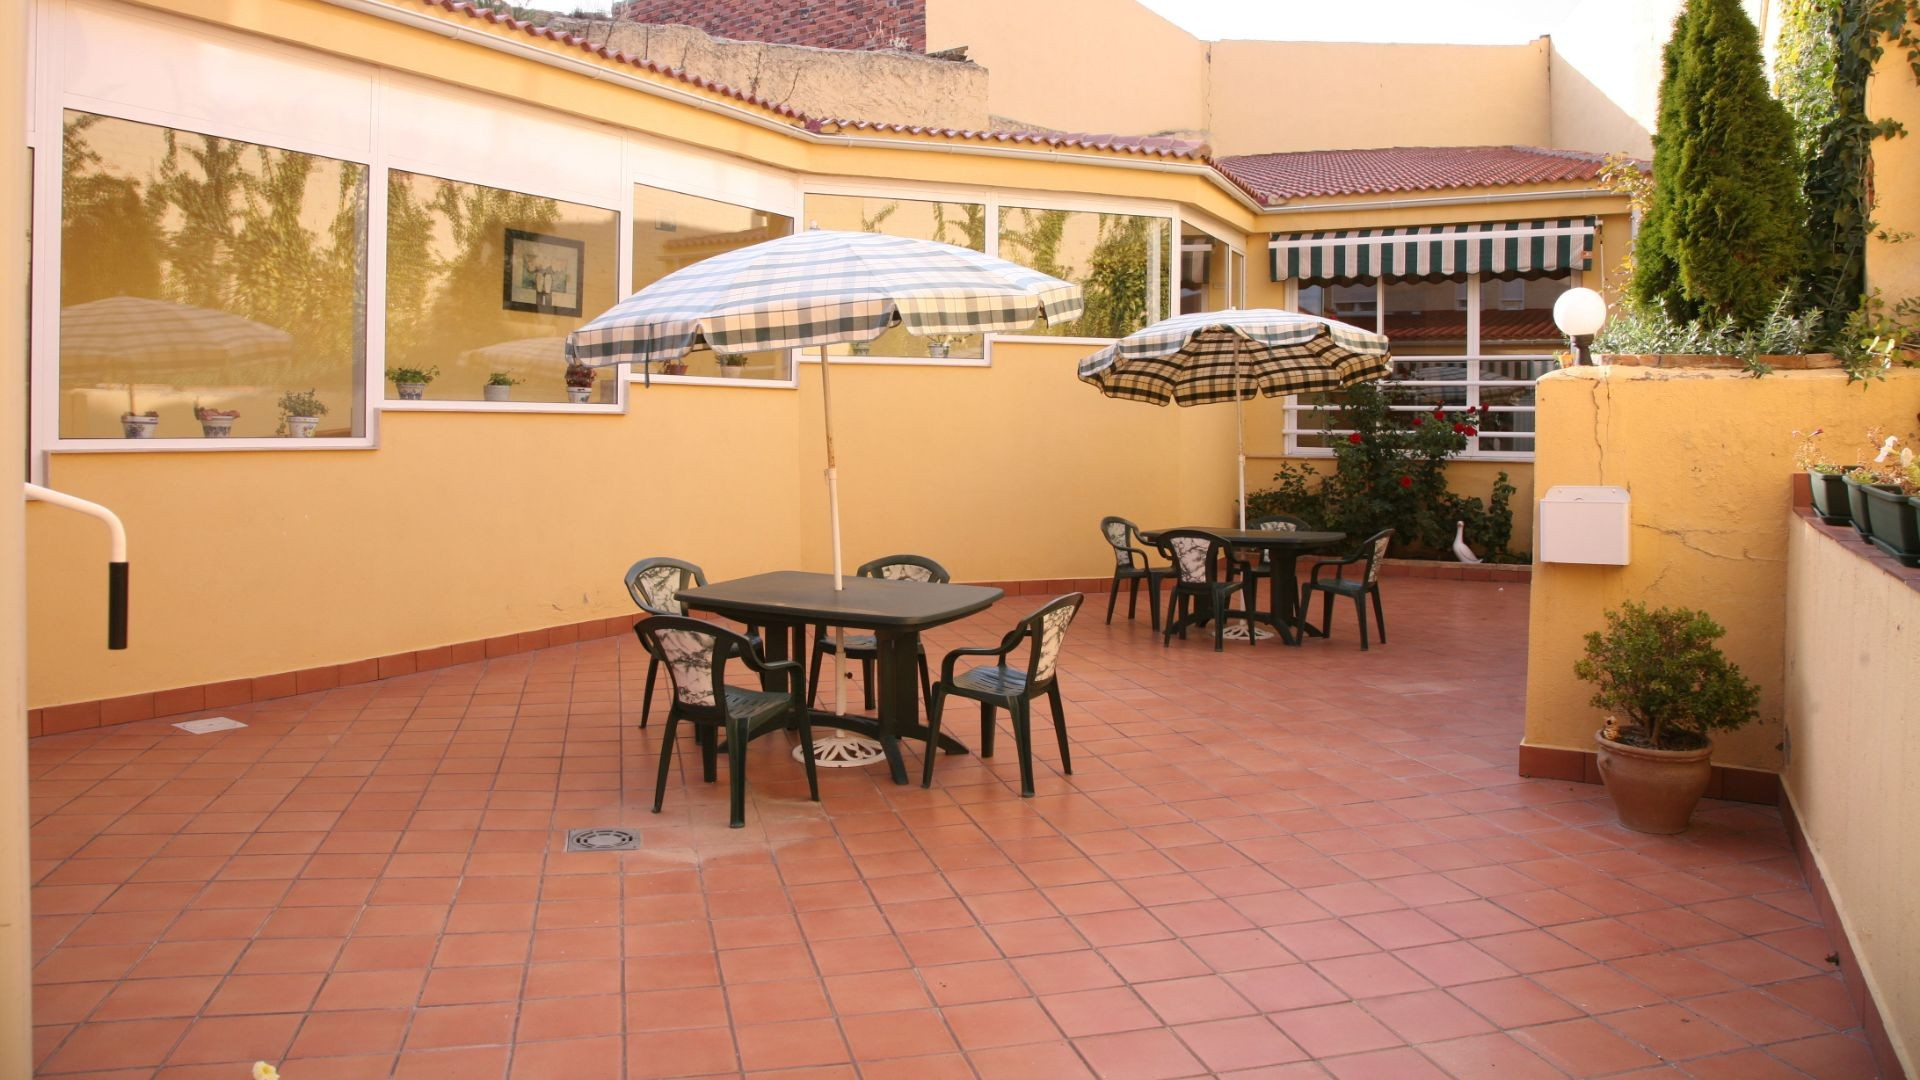 Residencia para Personas Mayores Santa Ana